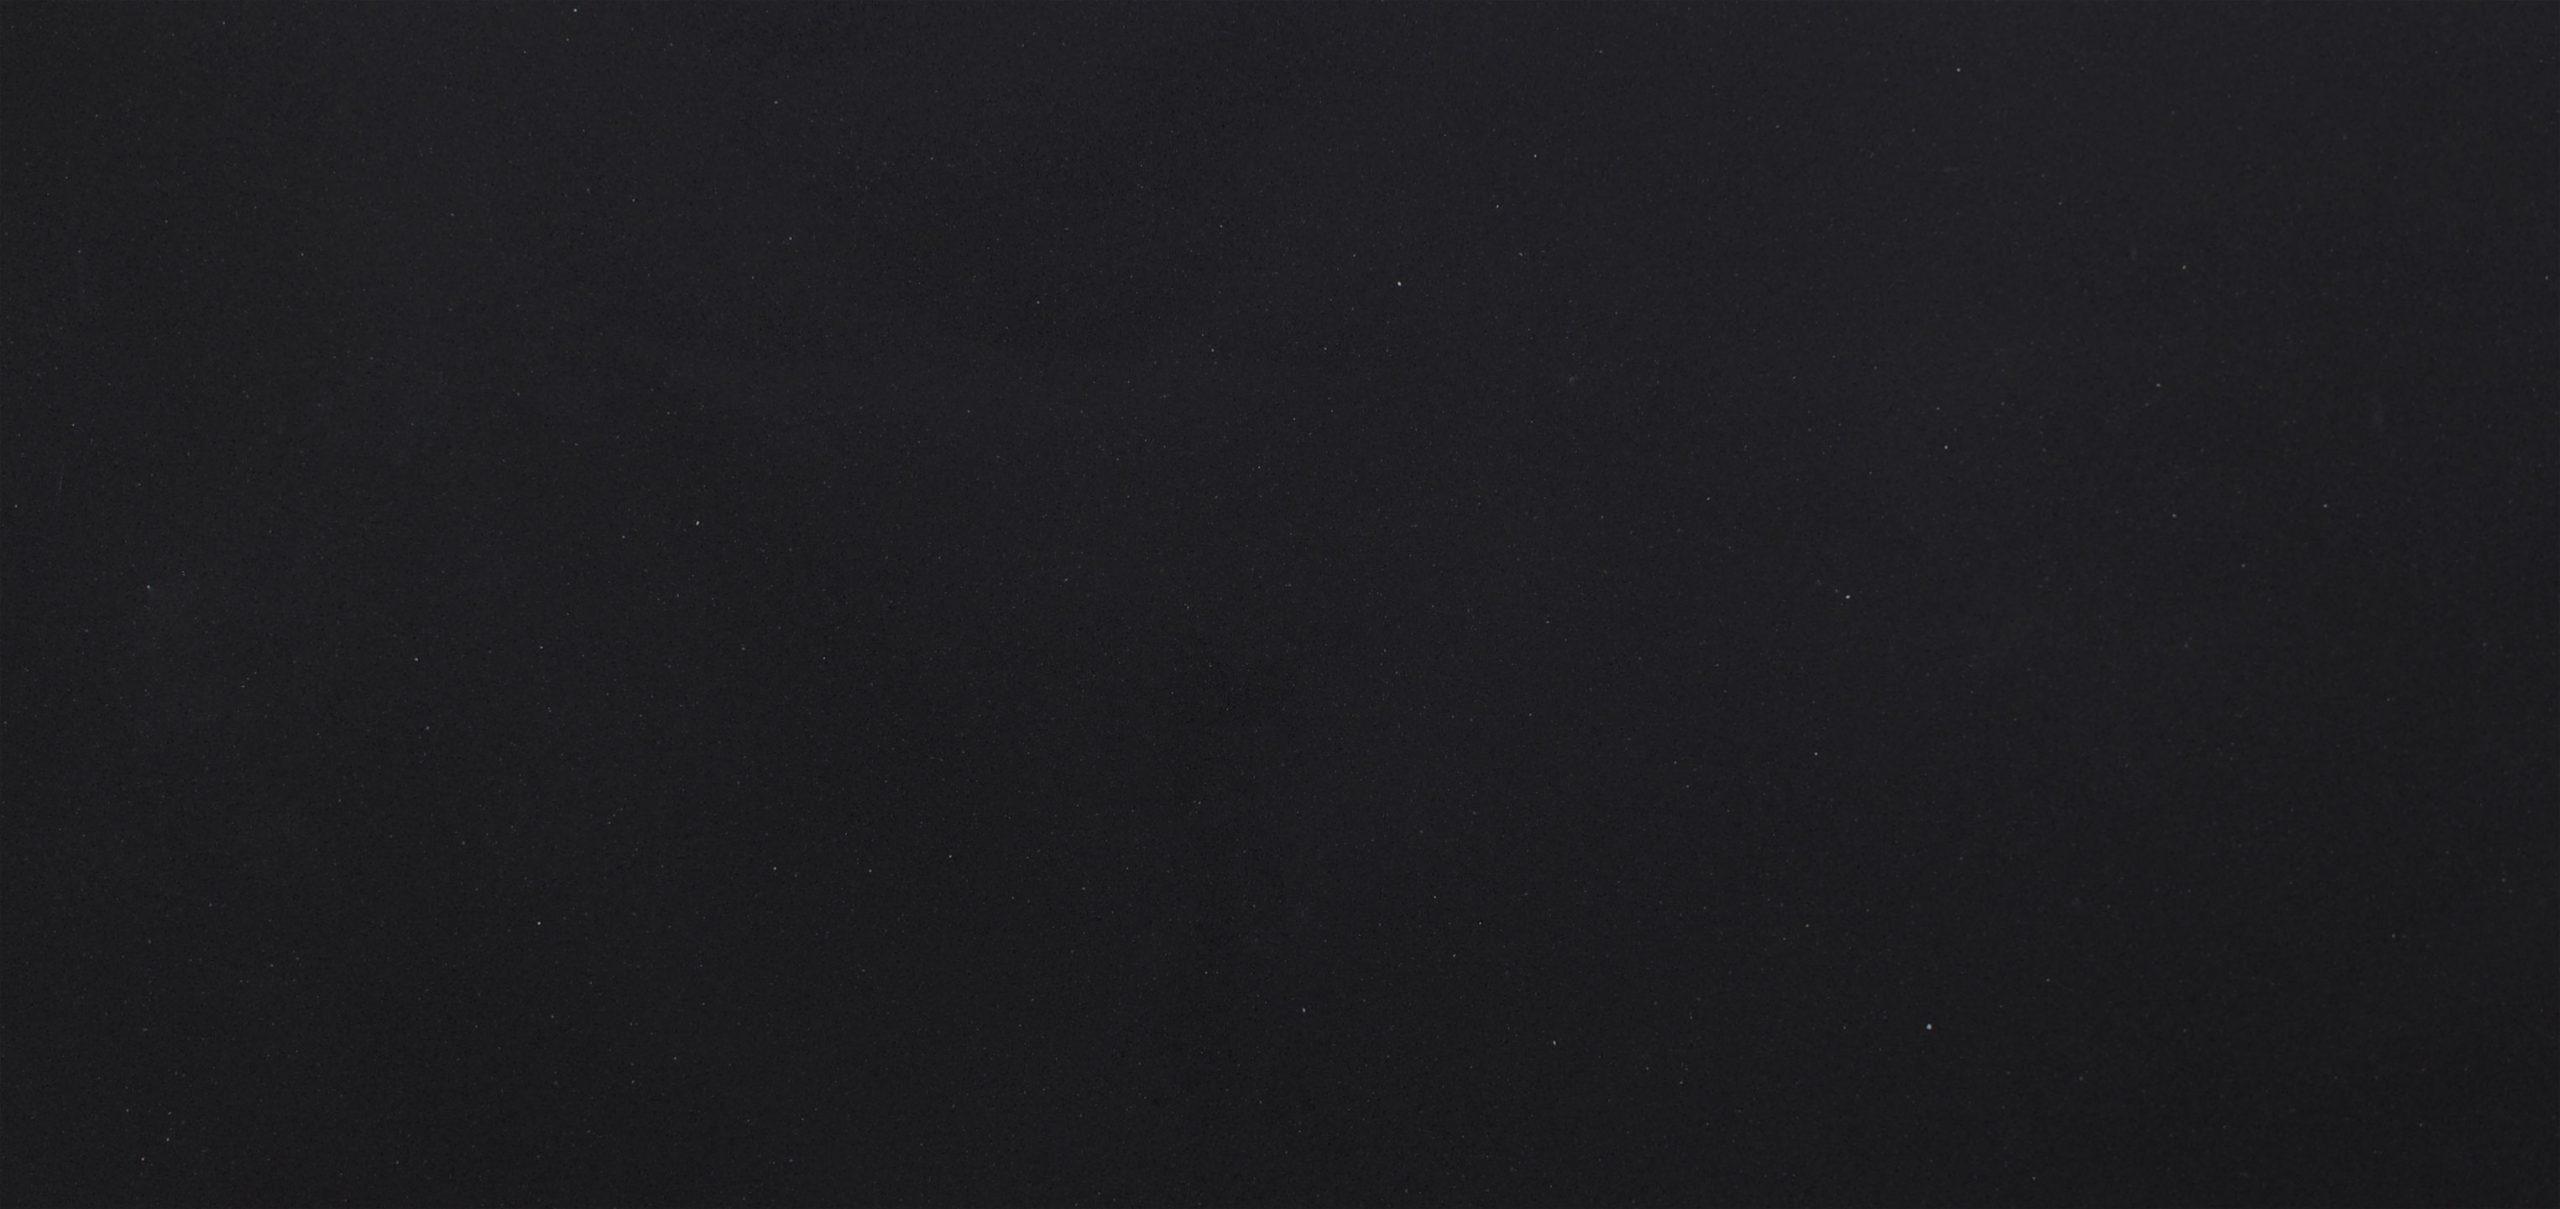 Vicostone Crystal Black BQ262 02